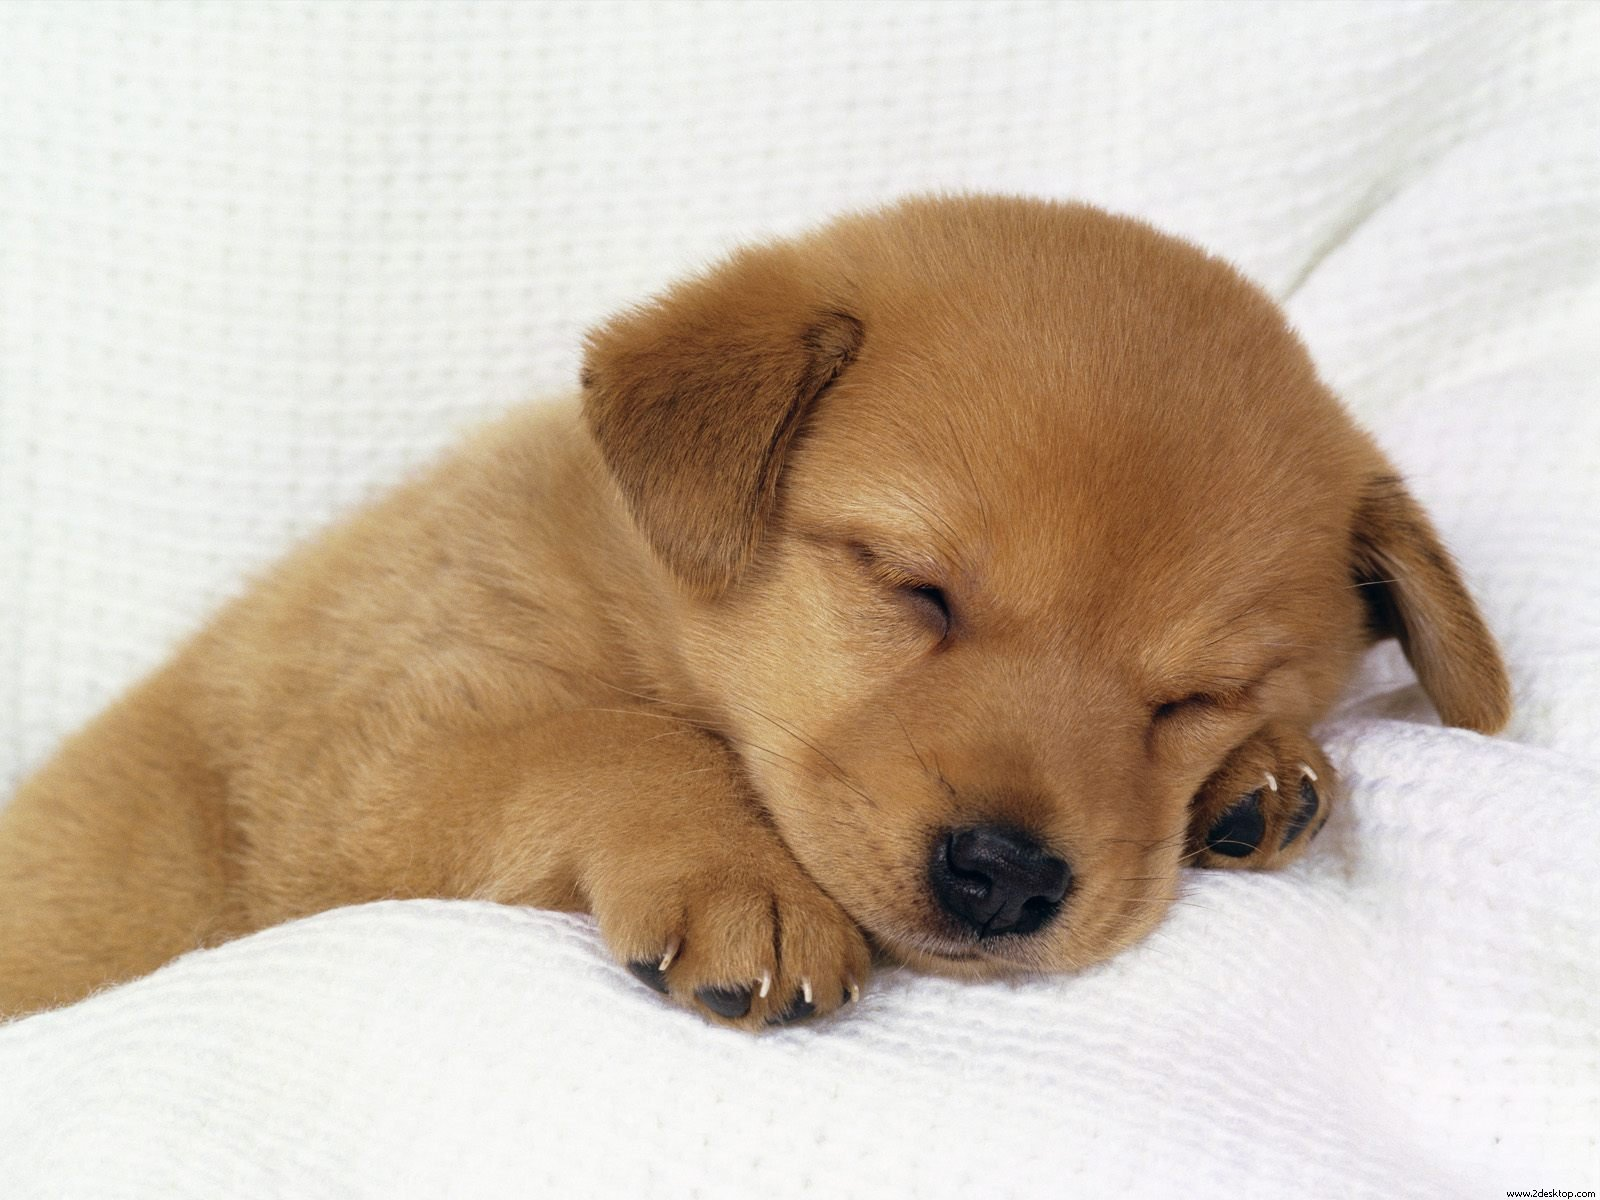 kabel data ilang: puppies screensaver